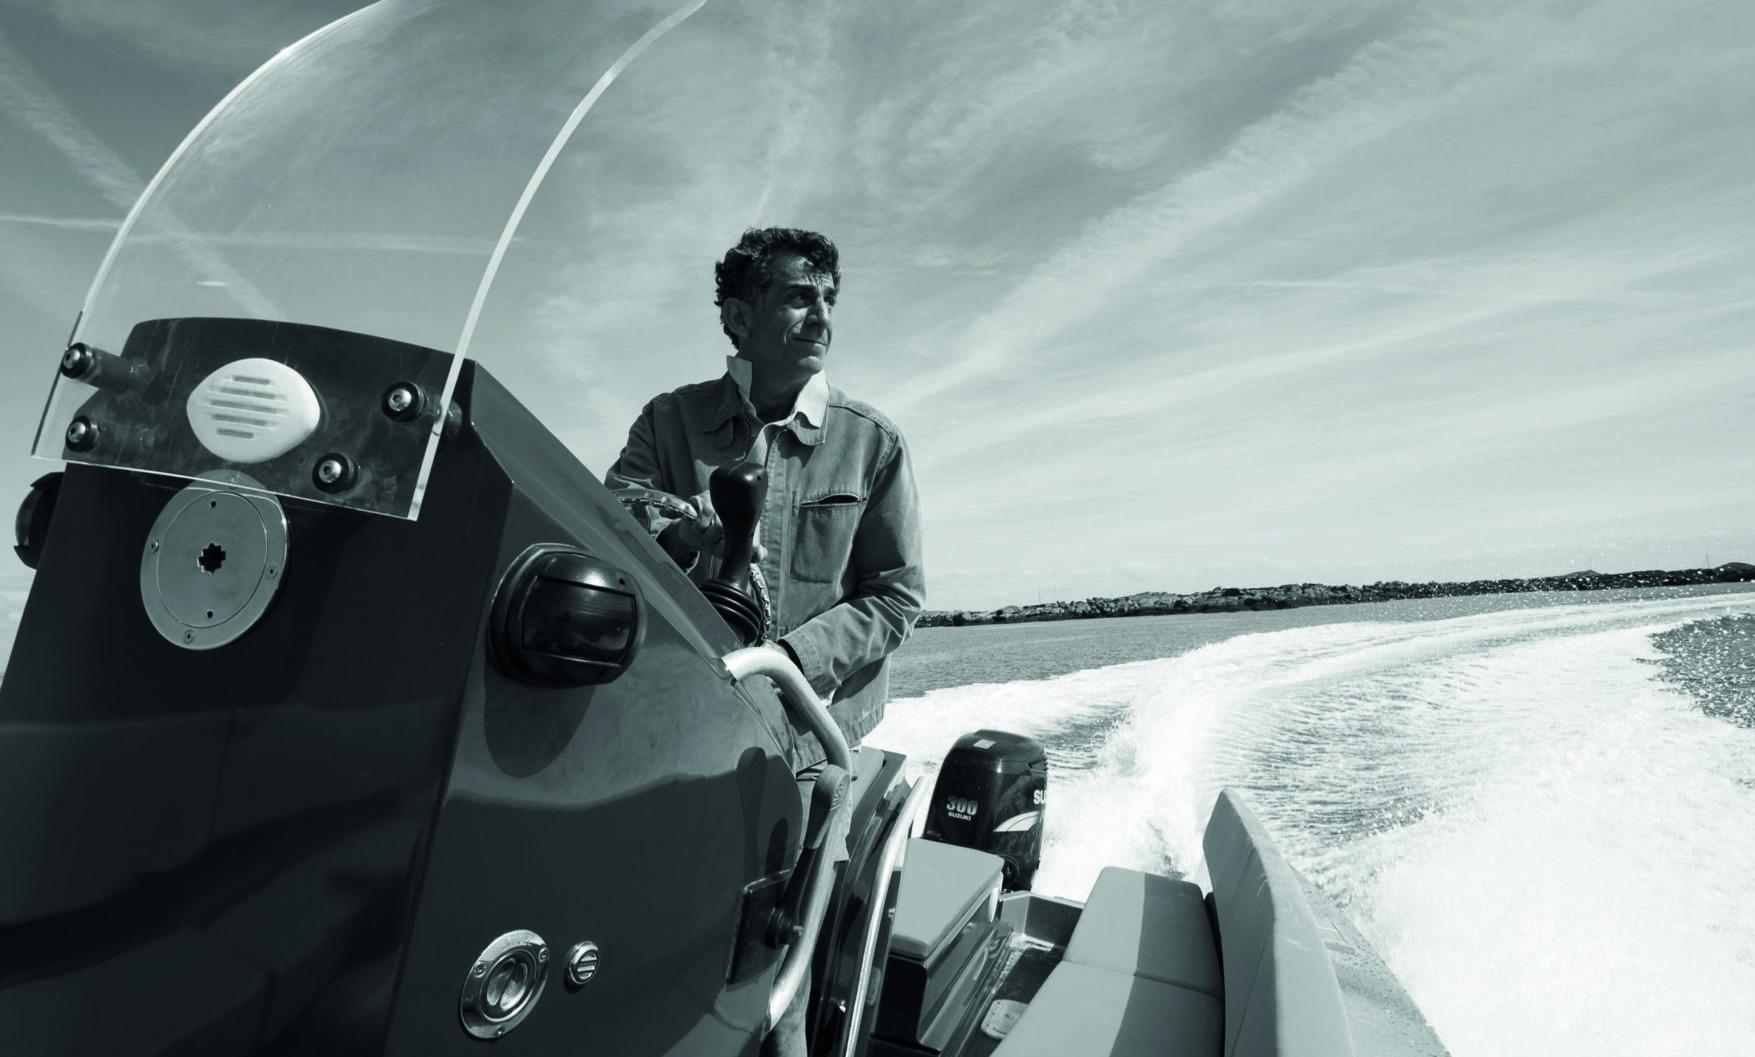 Antoine Brugidou sailing an Iguana boat